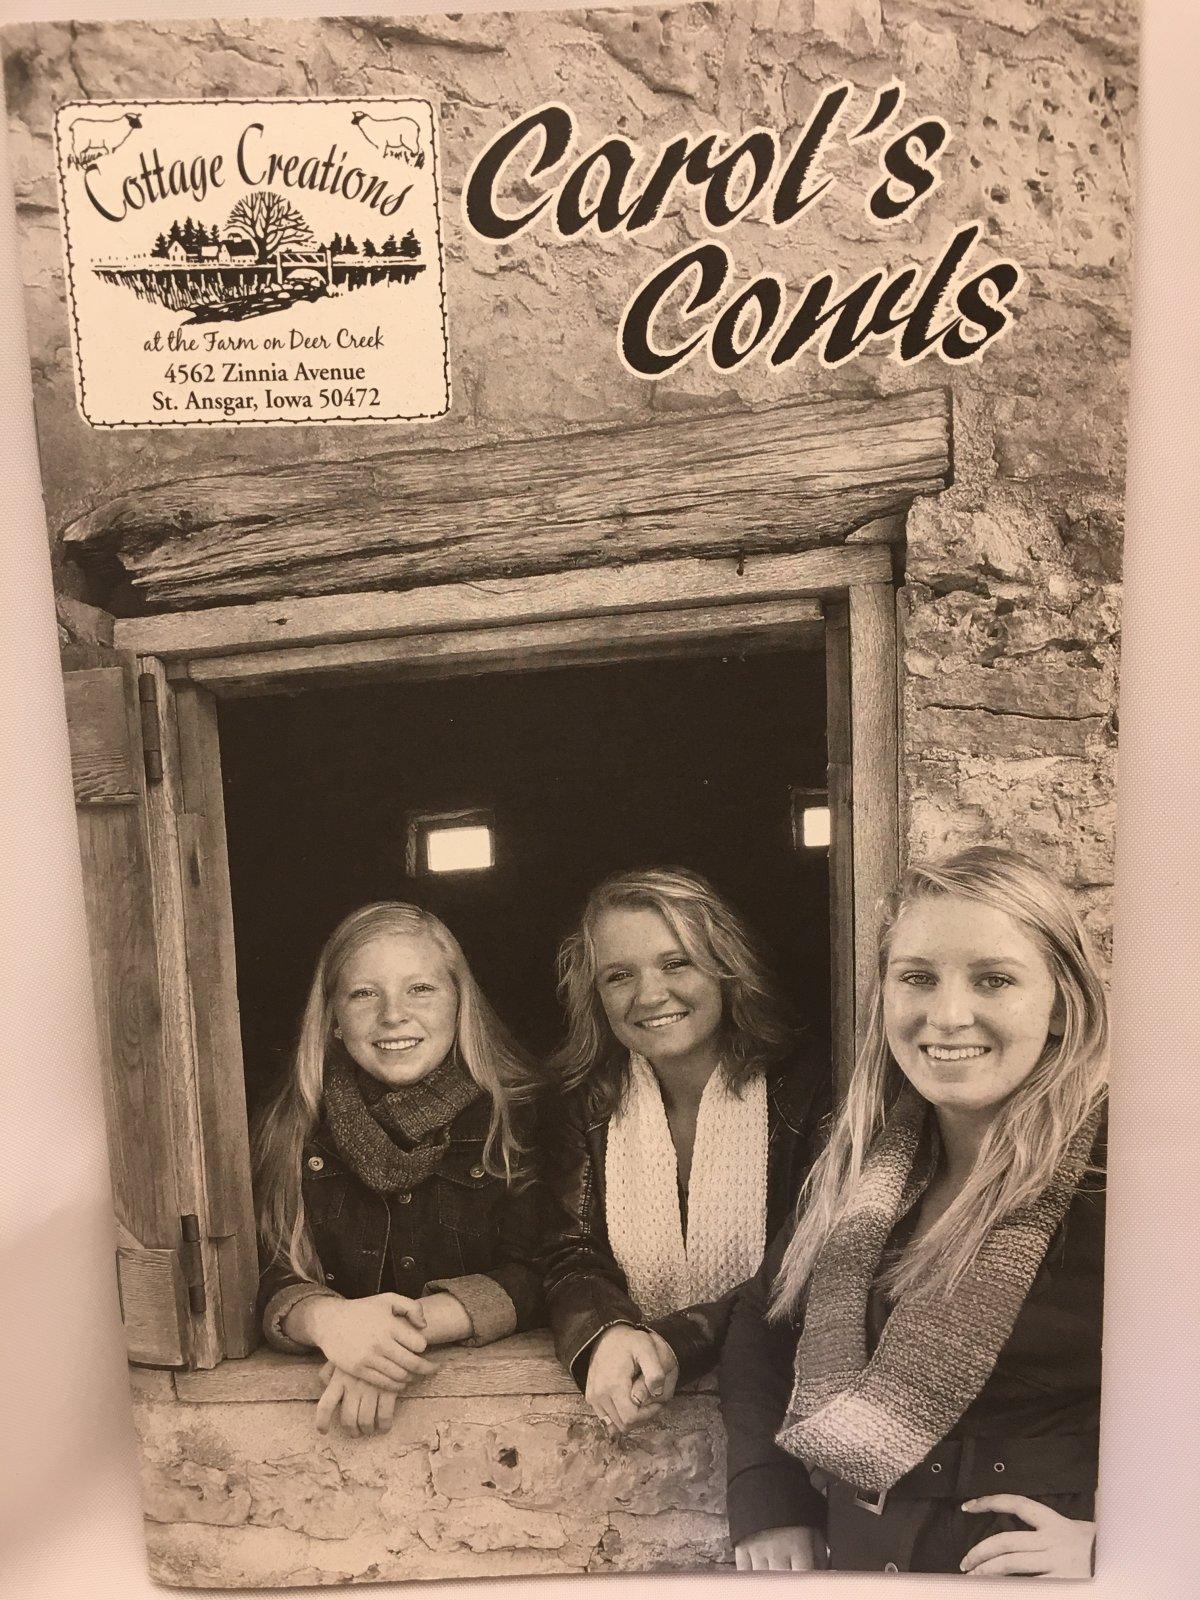 Carols Cowls